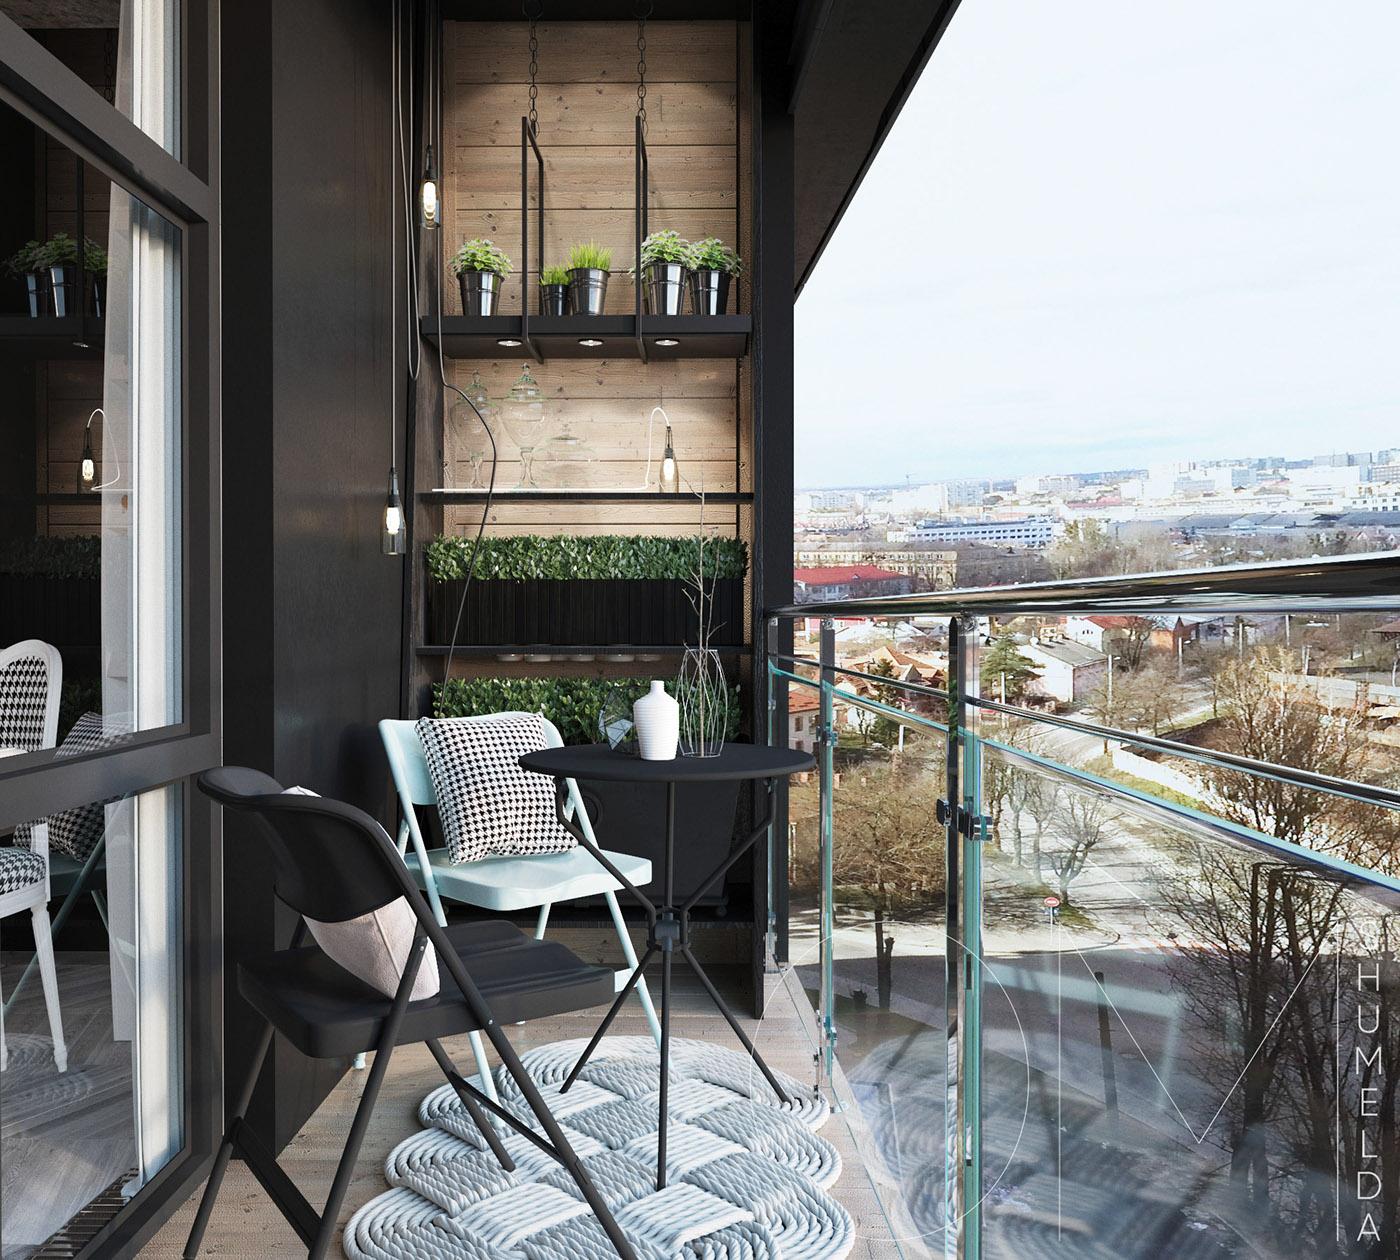 Rambarde de balcon en aluminium et plaques de verre